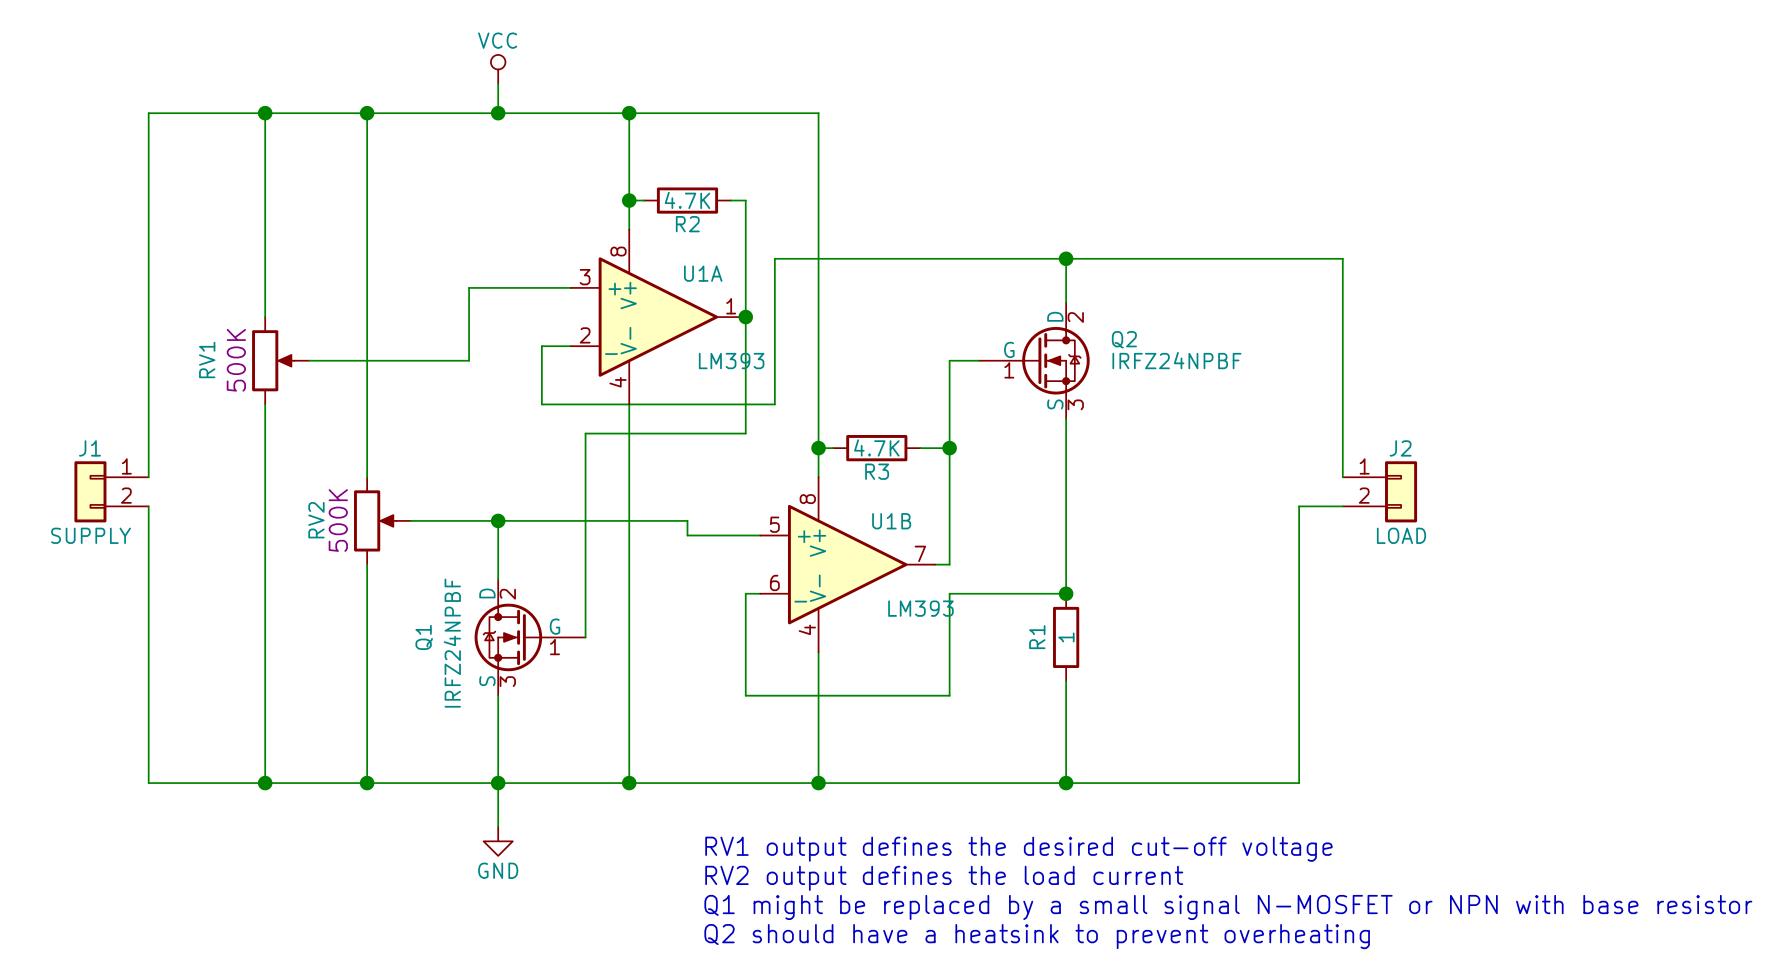 Constant Current Schematic Wiring Schematics Diagram Schematicrev4 Load With Cut Off Voltage Hackster Io Charge Controller Lm393